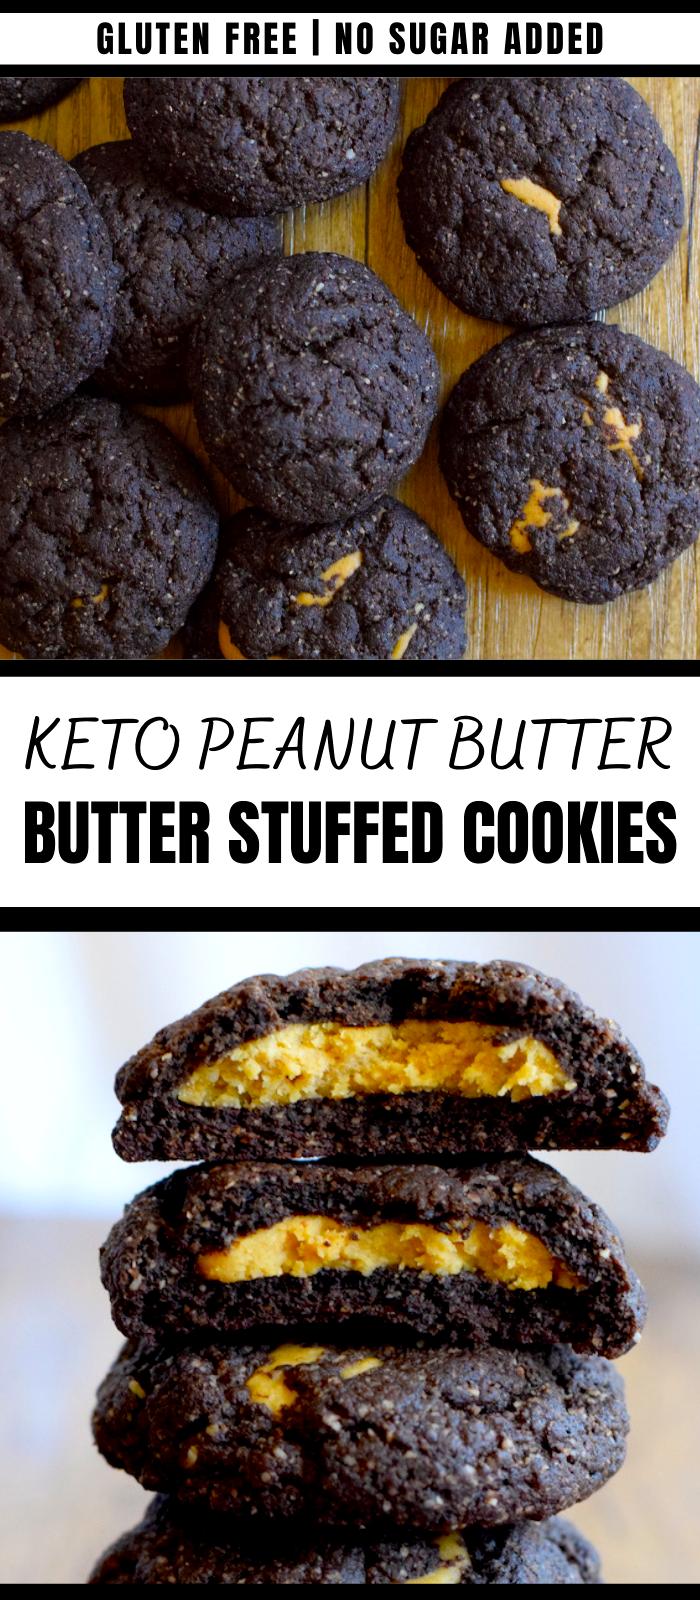 Keto Peanut Butter Stuffed Chocolate Cookies